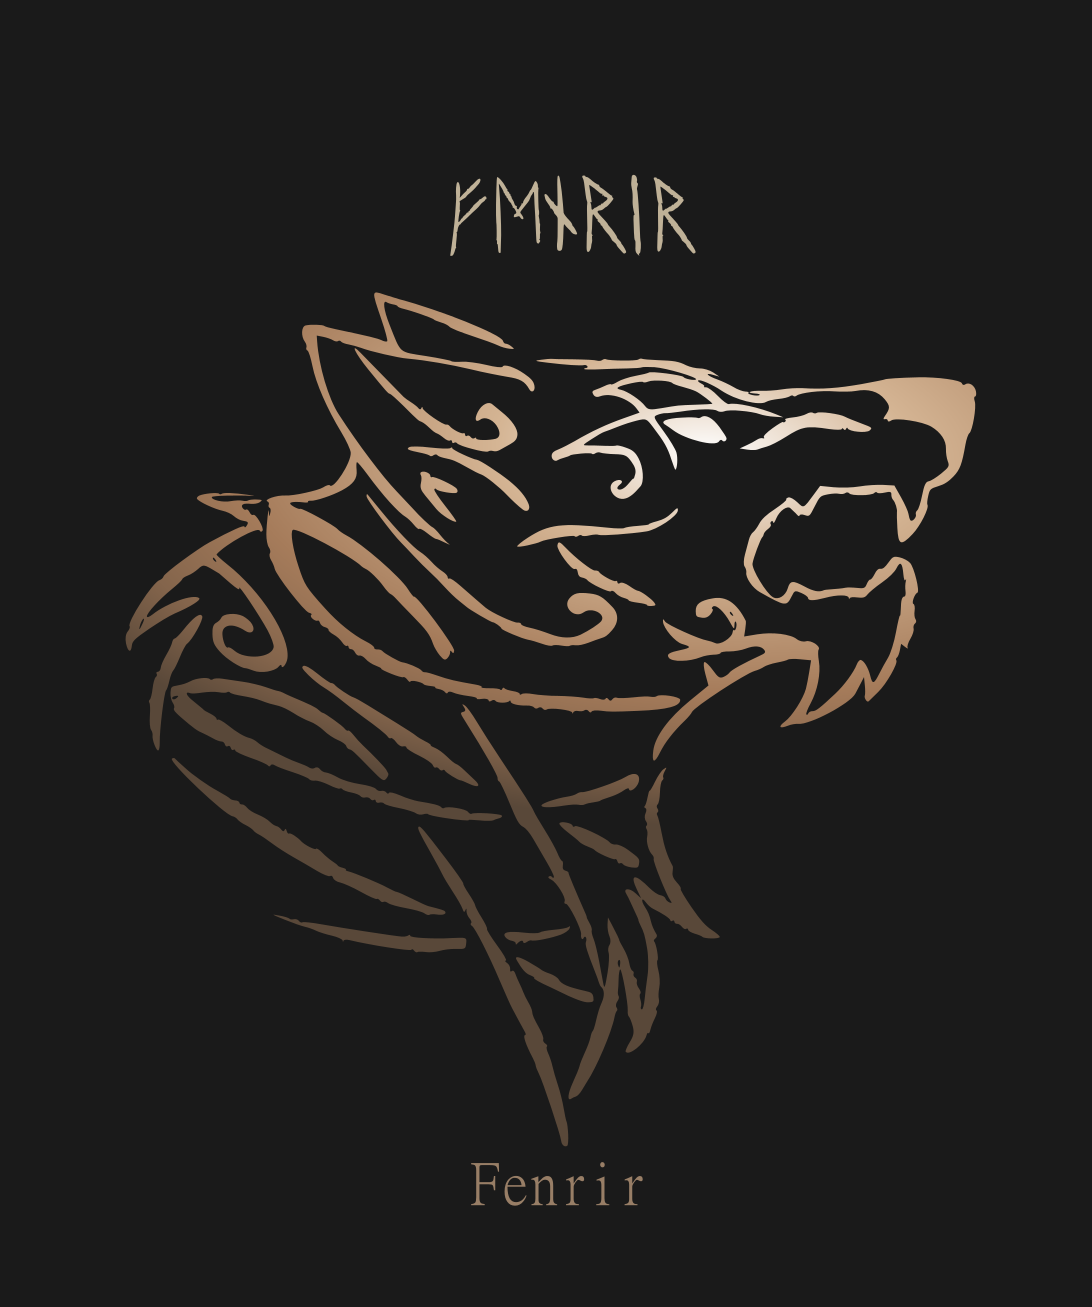 "afcf3cd08b0d3 borboranoir: "" Fenrir Sigil He's the son of the god Loki and the giantess  Angrboða, brother of the serpent Jormungand and the underworld goddess Hel."